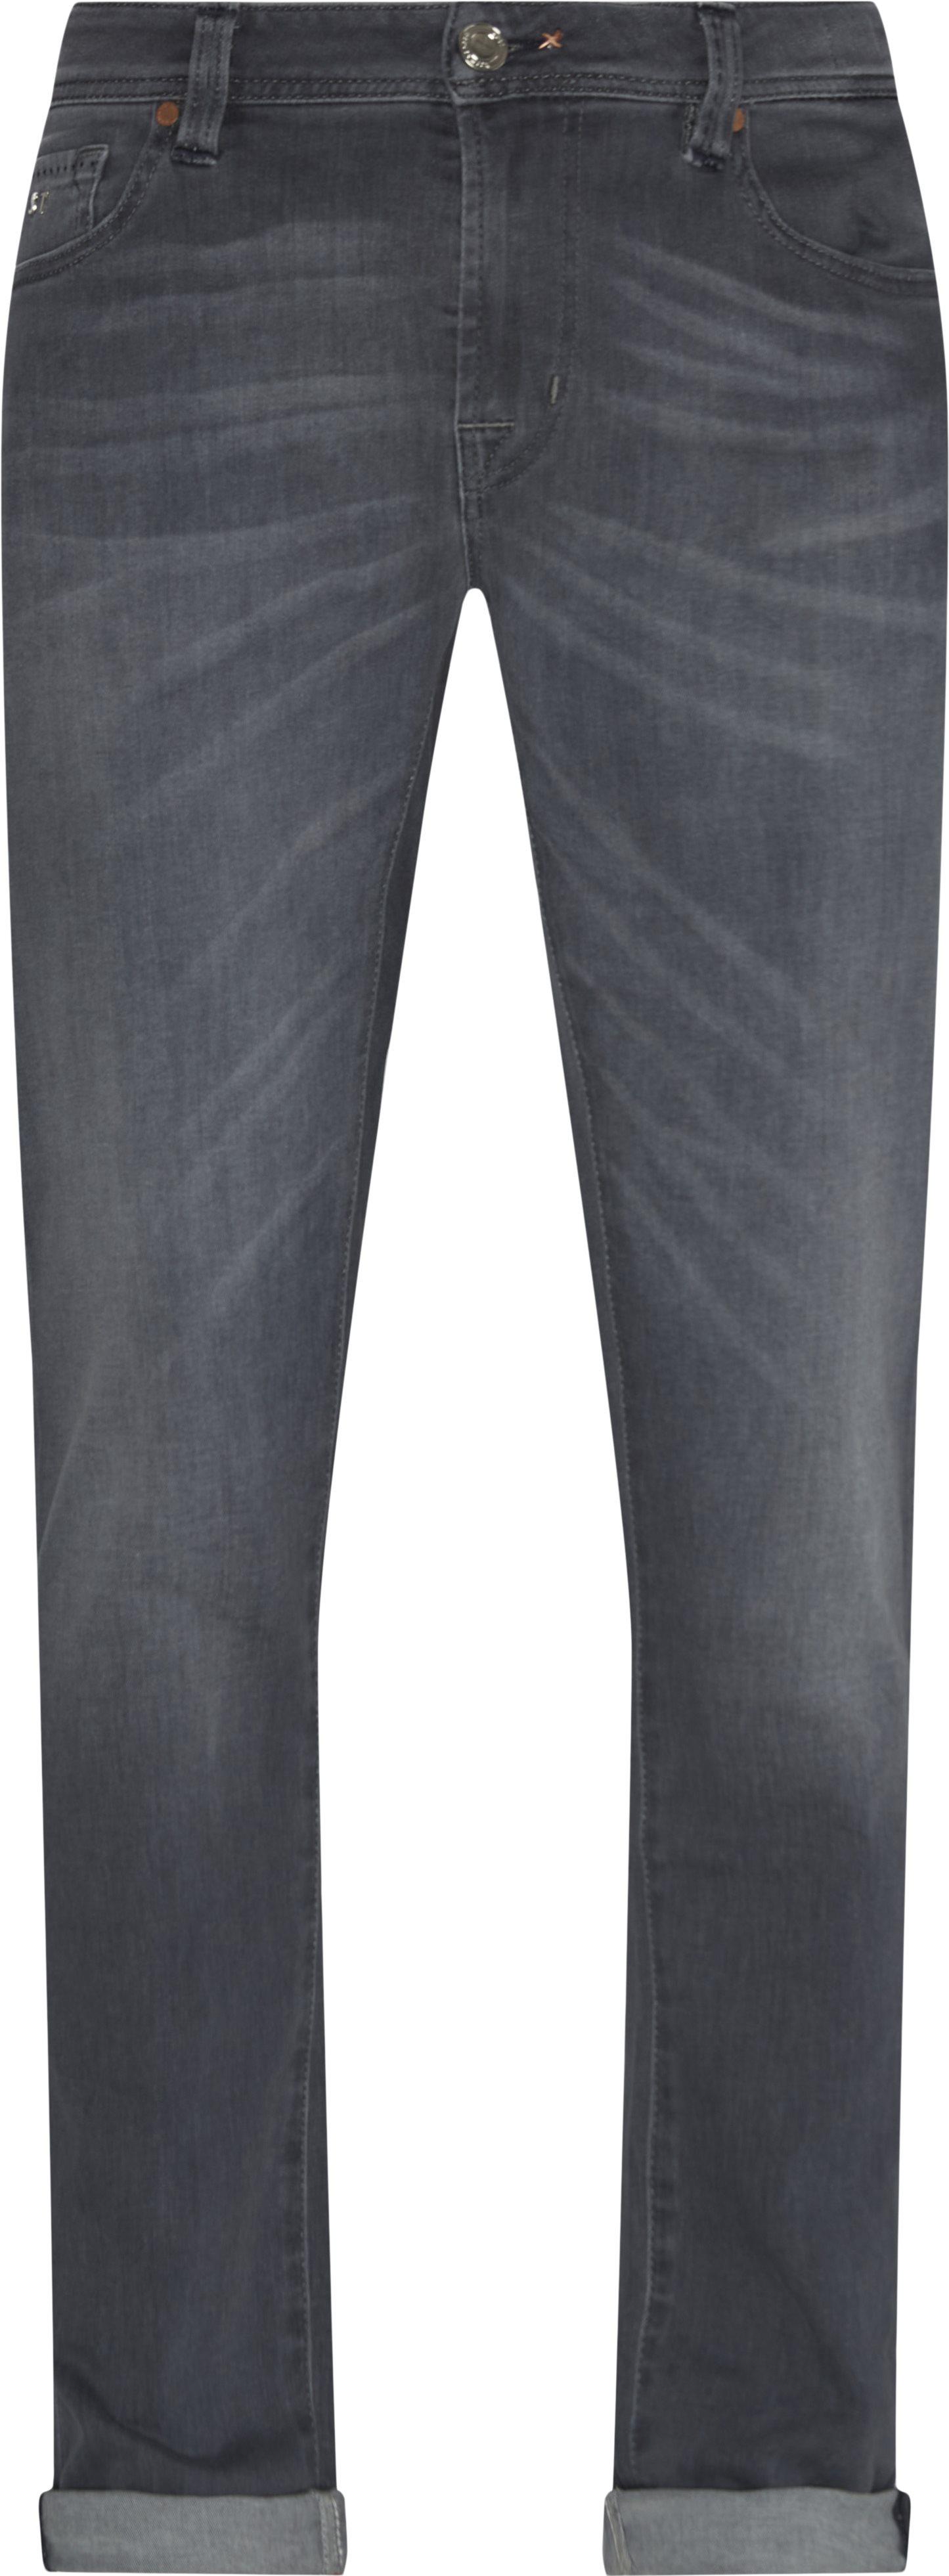 Jeans - Slim fit - Grå